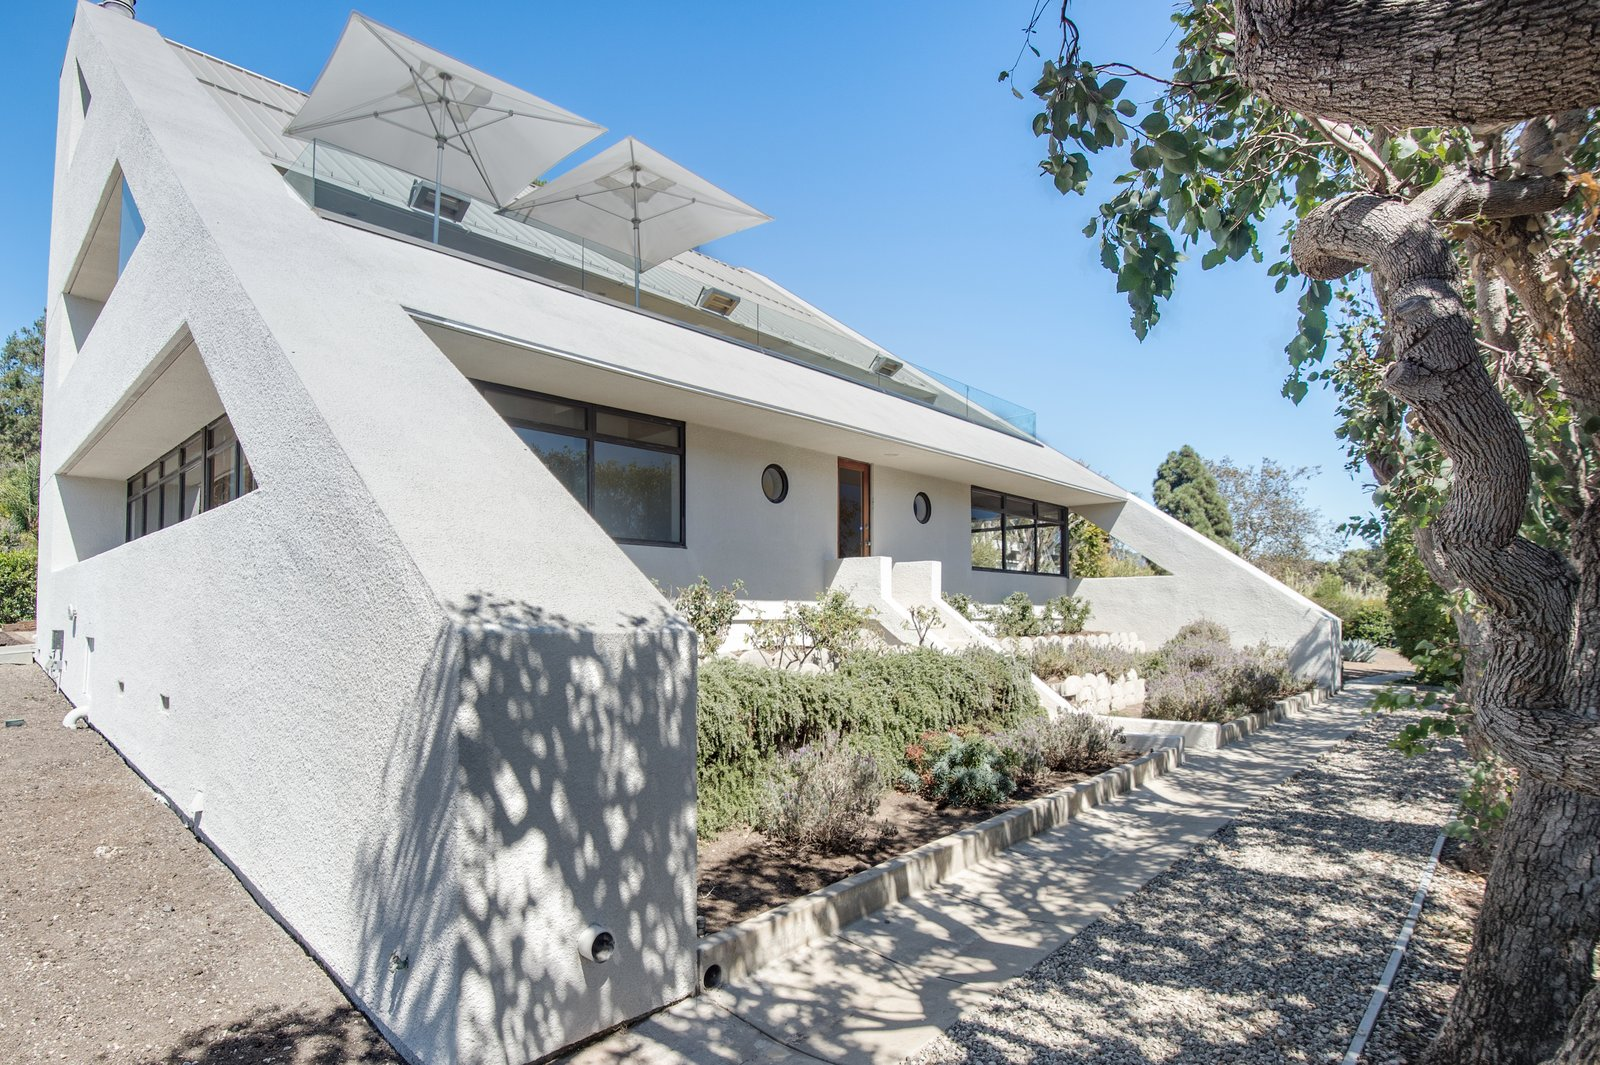 Malibu Star Trek home exterior